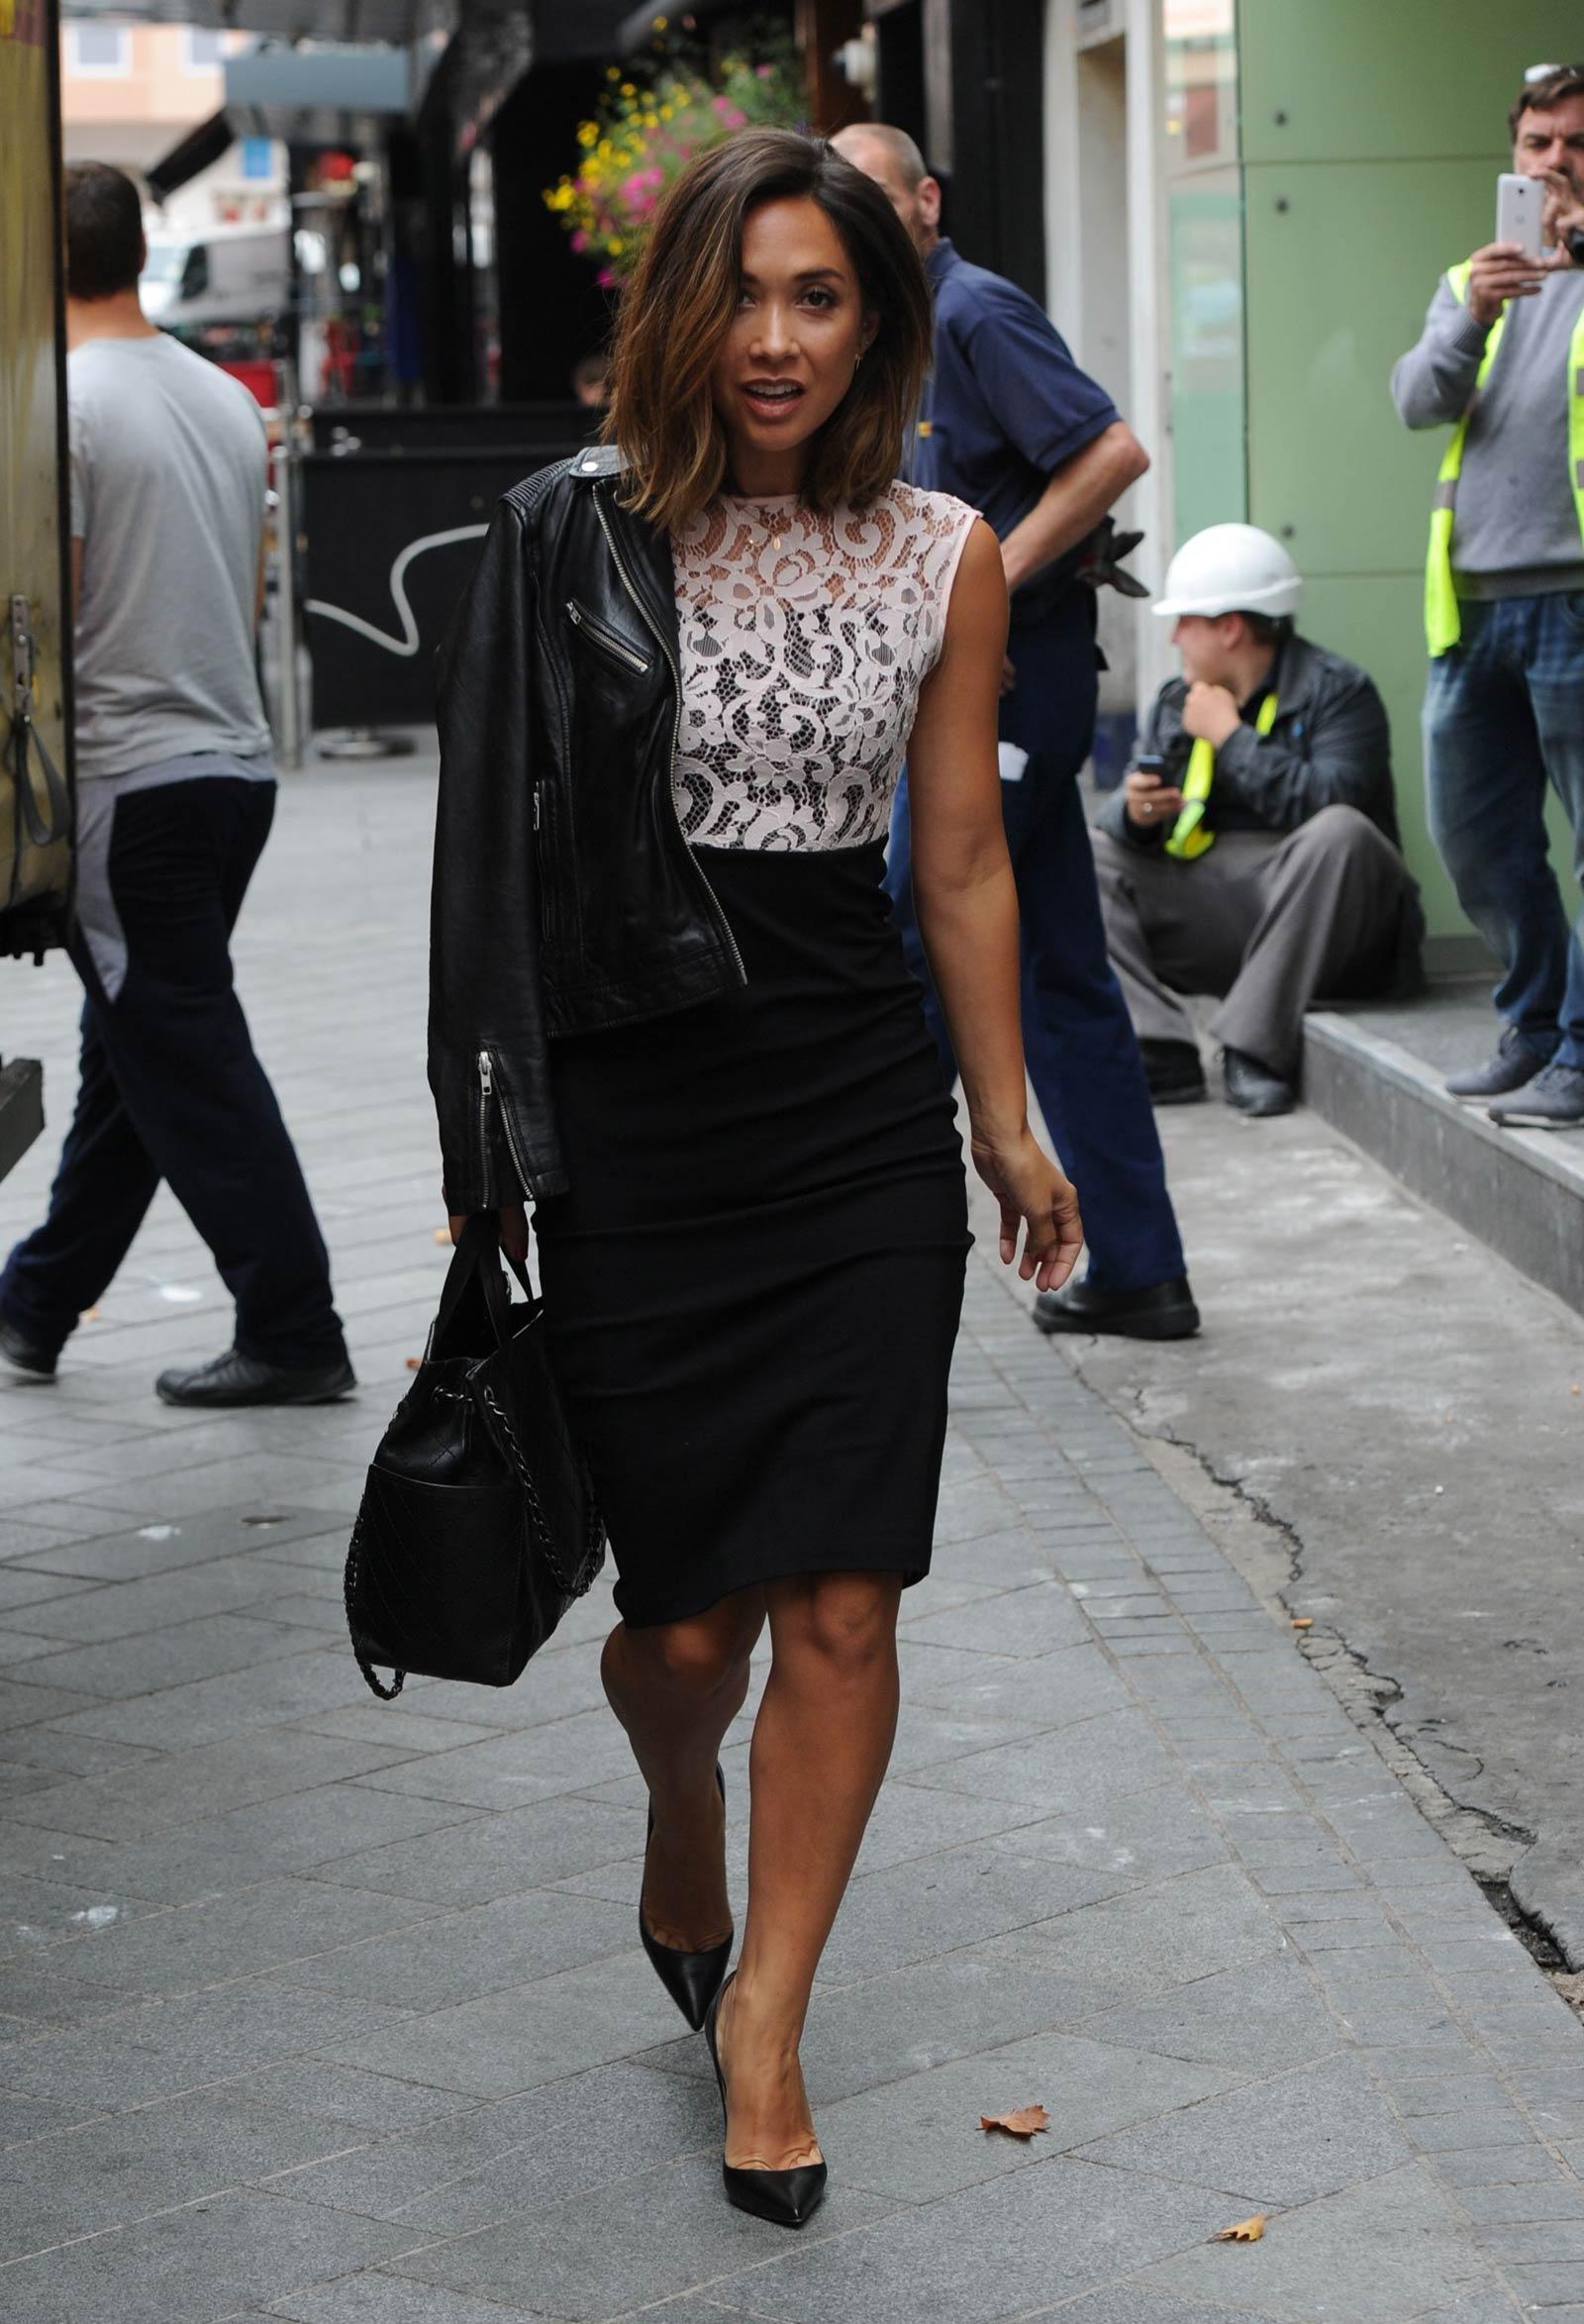 Myleene Klass leaving Global Radio London